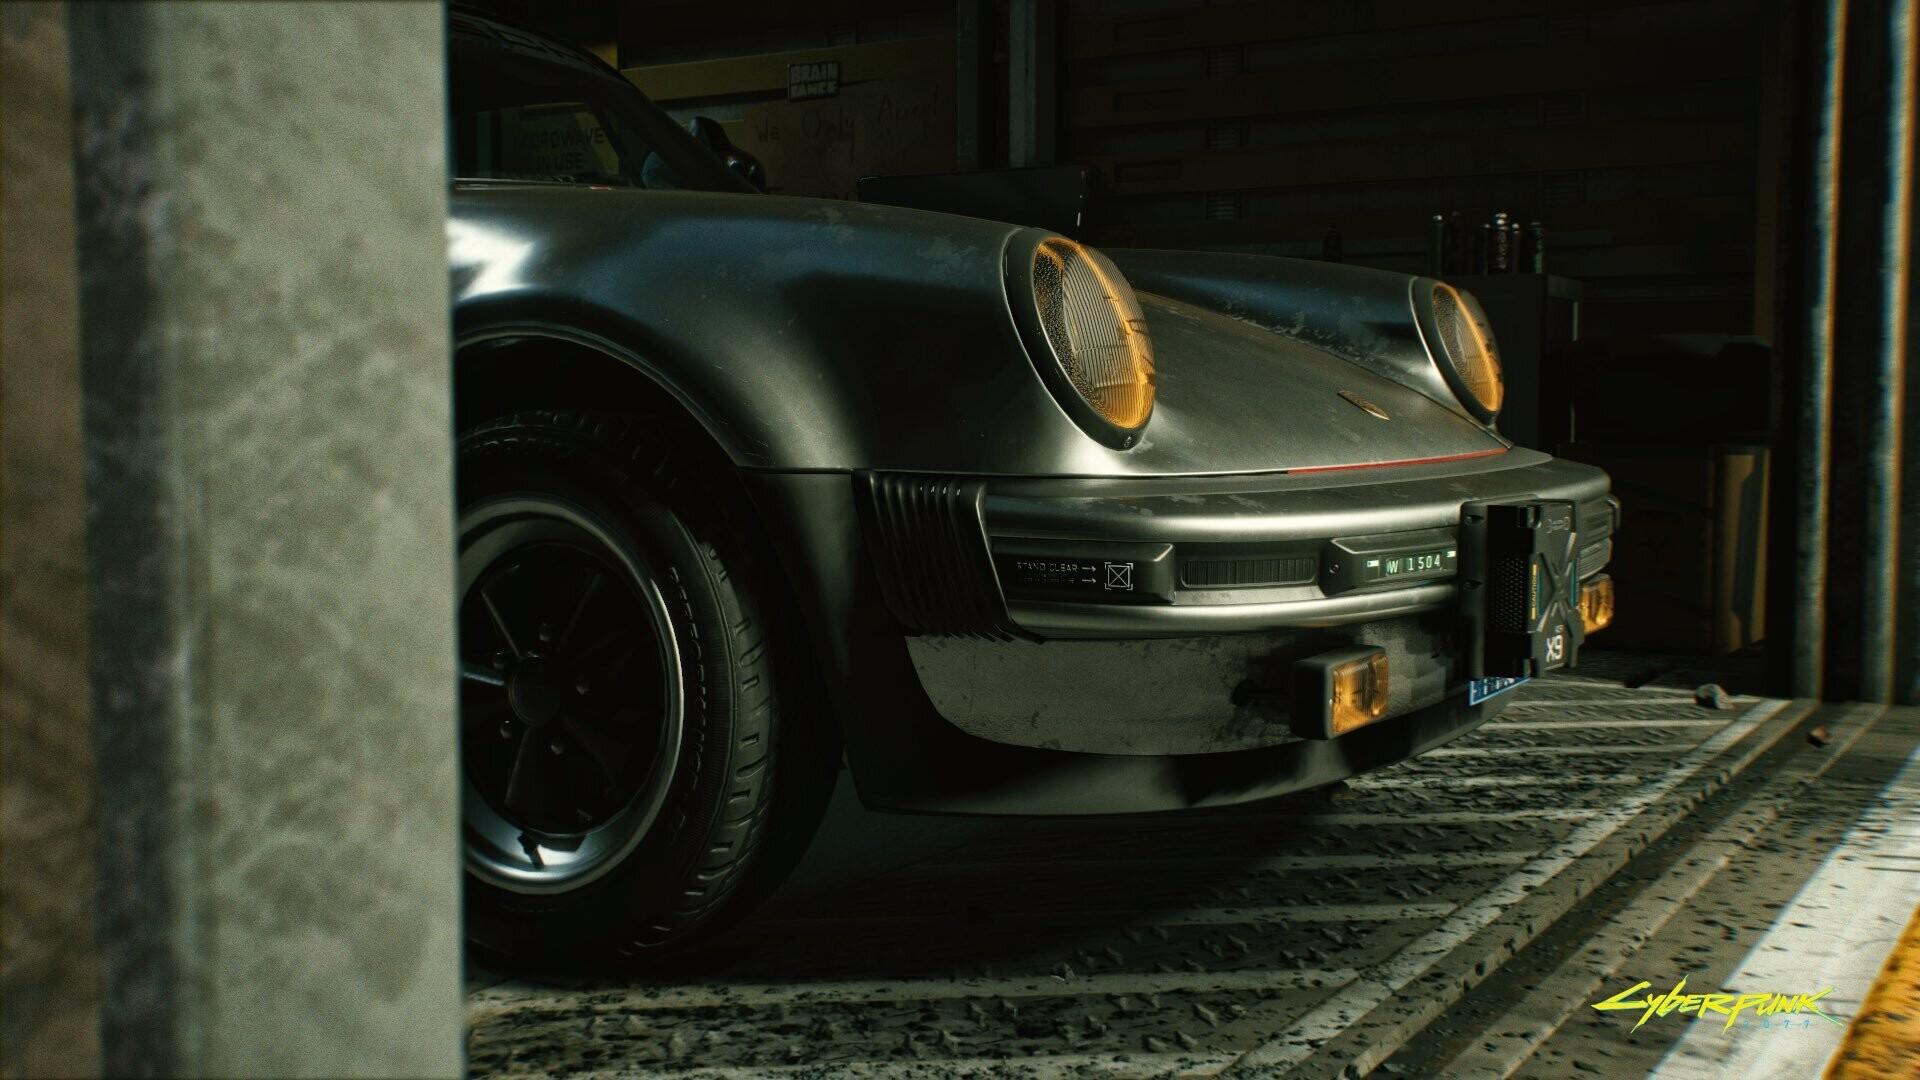 Porsche 911 Turbo для рокербоя и лучший косплей Cyberpunk 2077